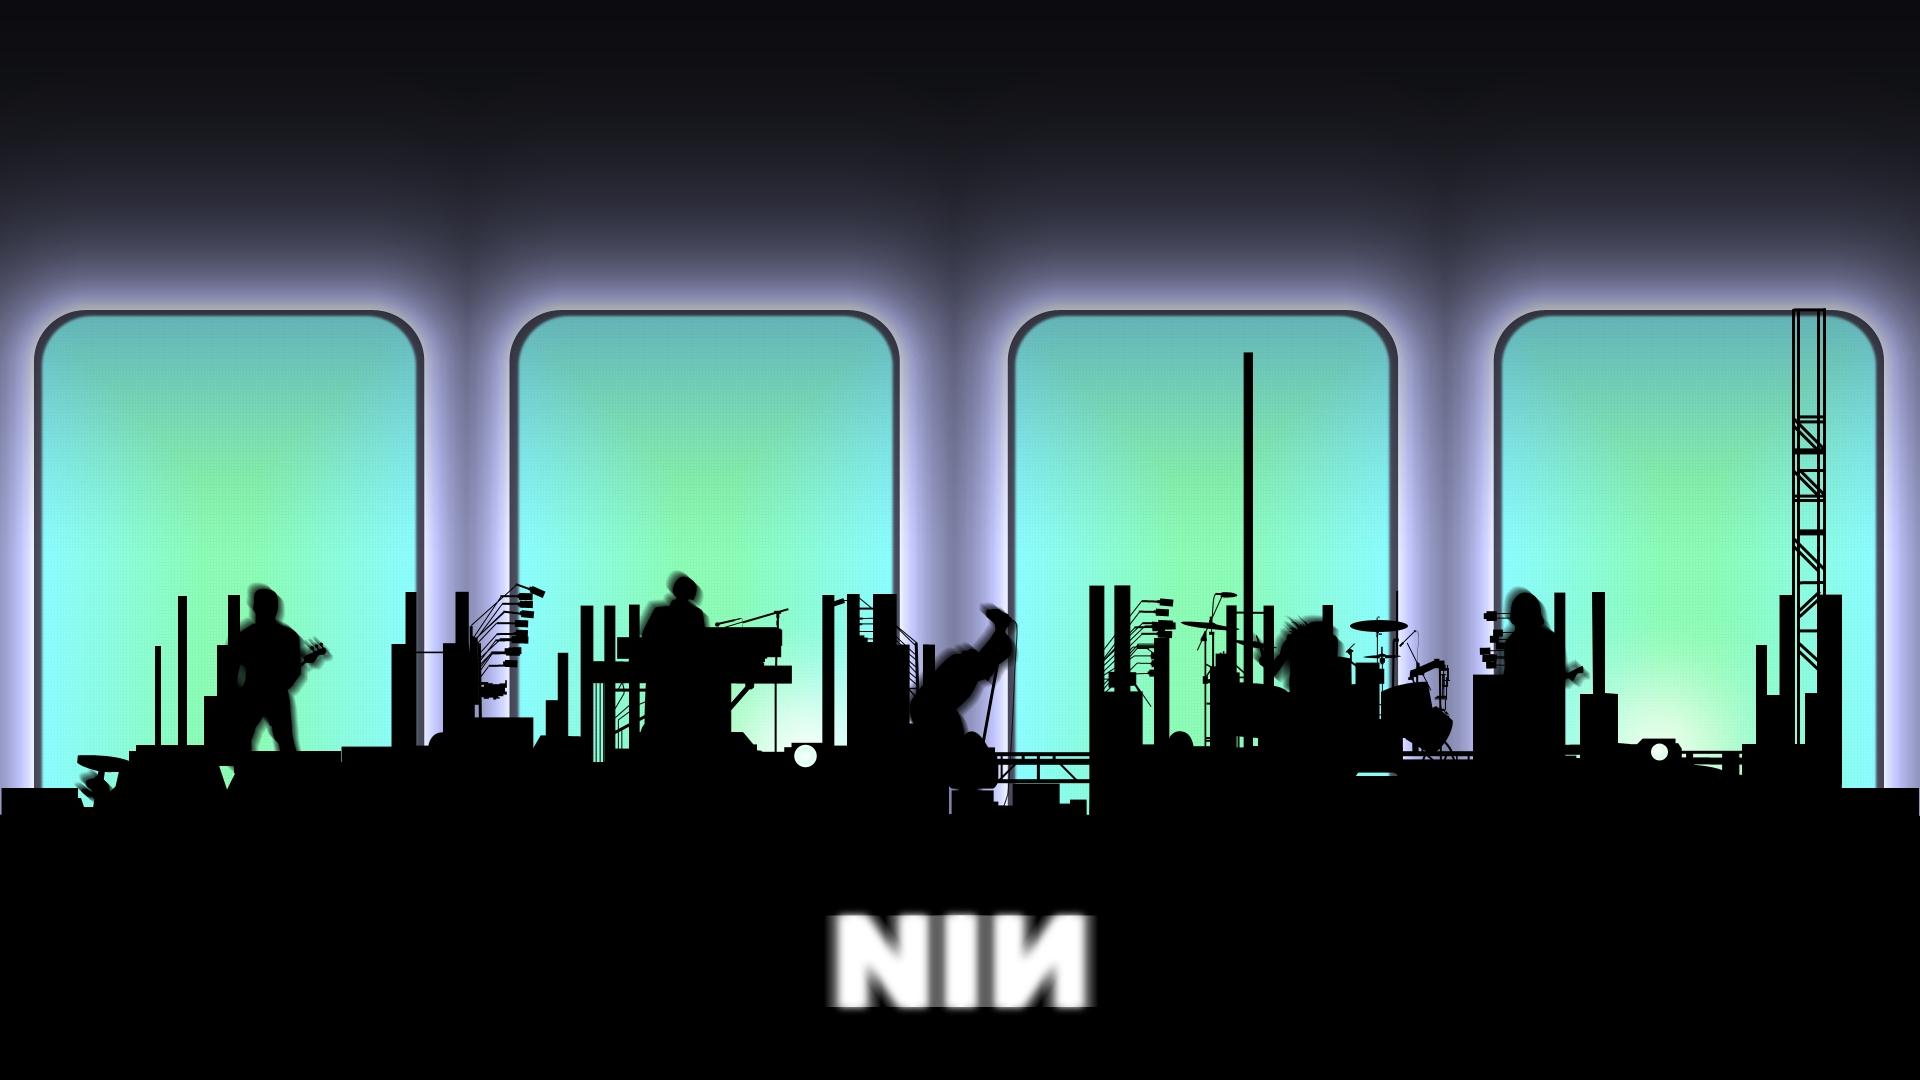 Nine Inch Nails Wallpaper Nine Inch Nails Wallpaper Full Hd